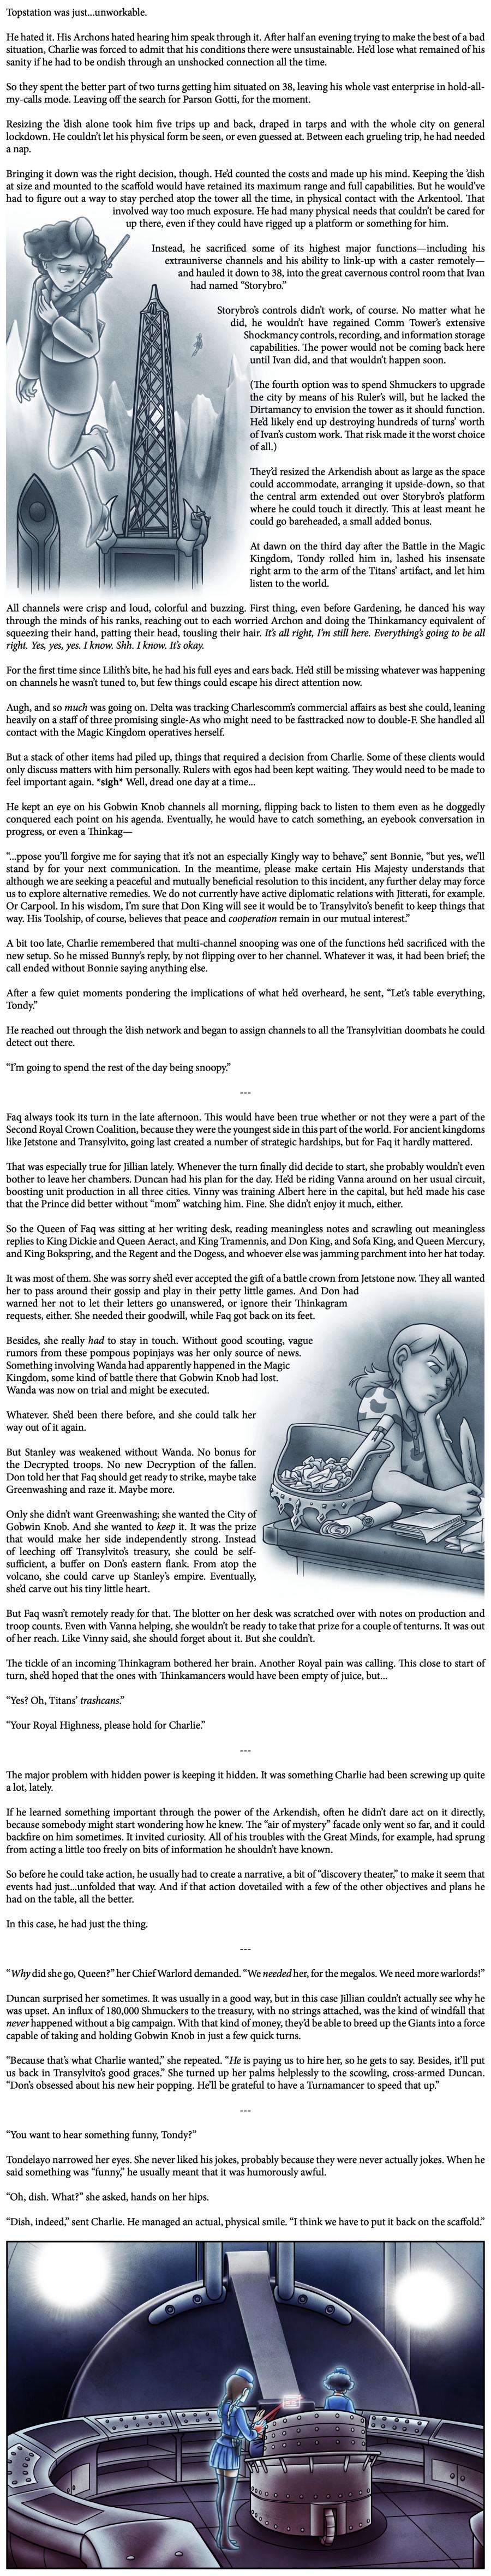 Comic - Book 4 - Page 5 - Prologue 5